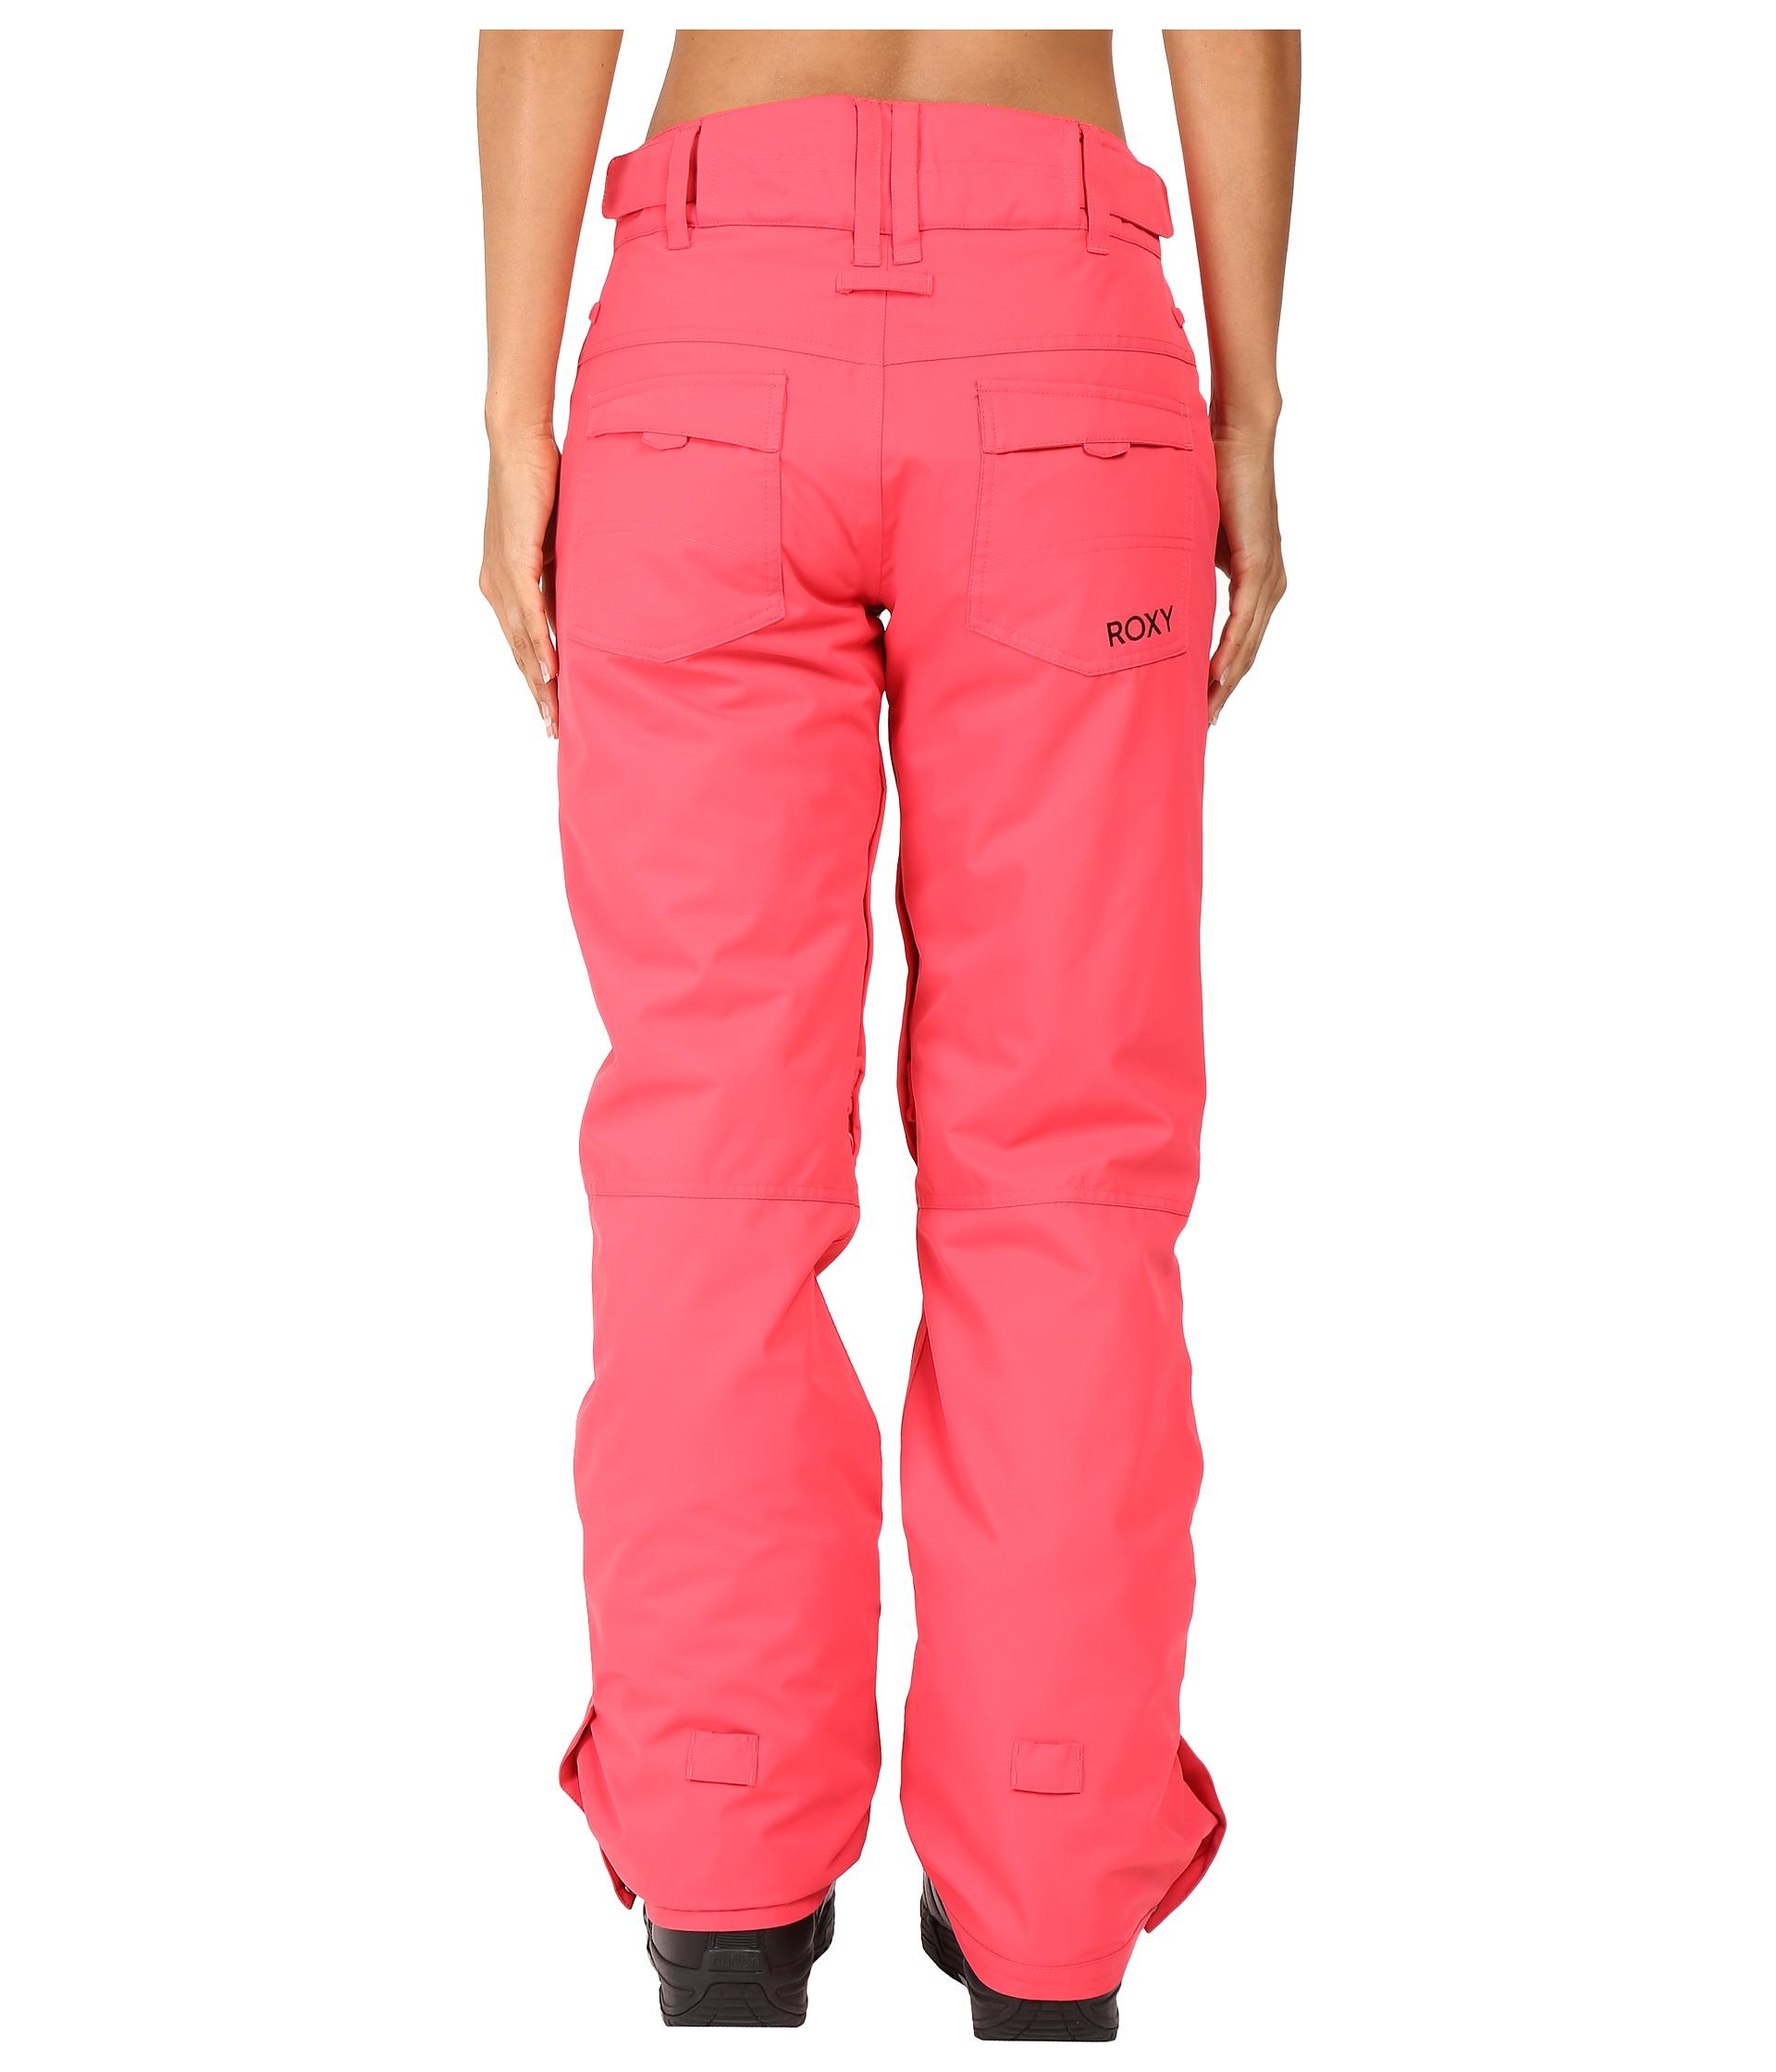 roxy backyard pant paradise pink zappos com free